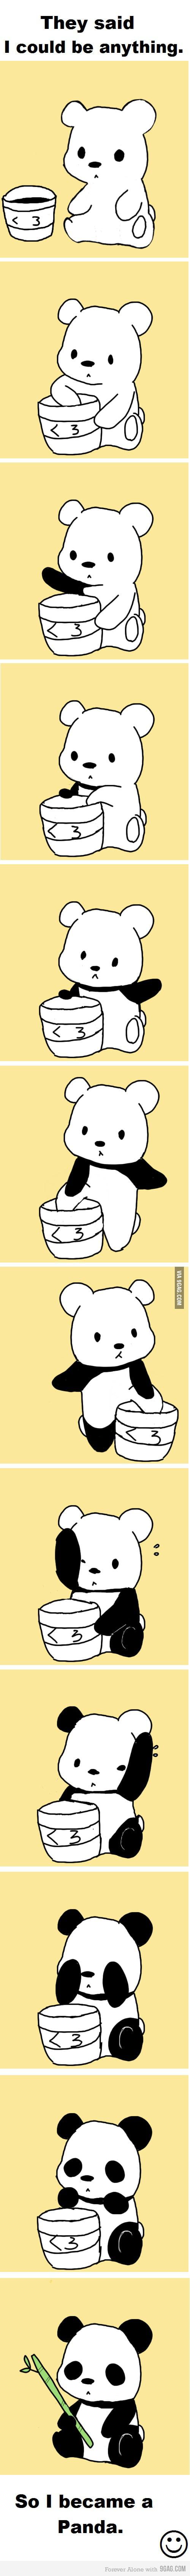 I'm a panda now